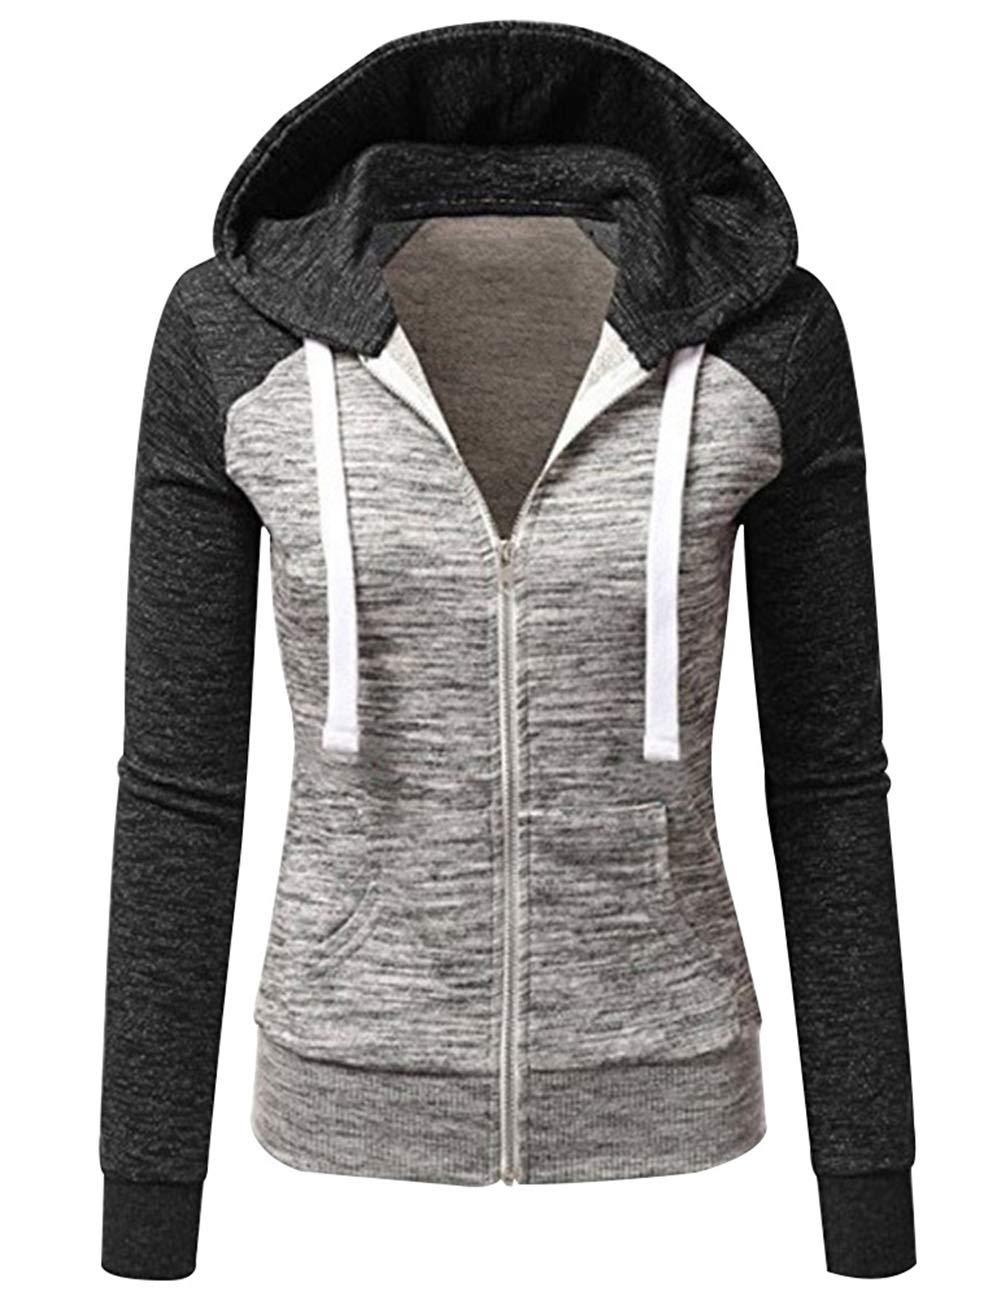 YJQ Women's Fashion Color Block Long Sleeve Zip Up Hoodie Sweatshirt Sports Jacket Activewear Coat (M, Black)